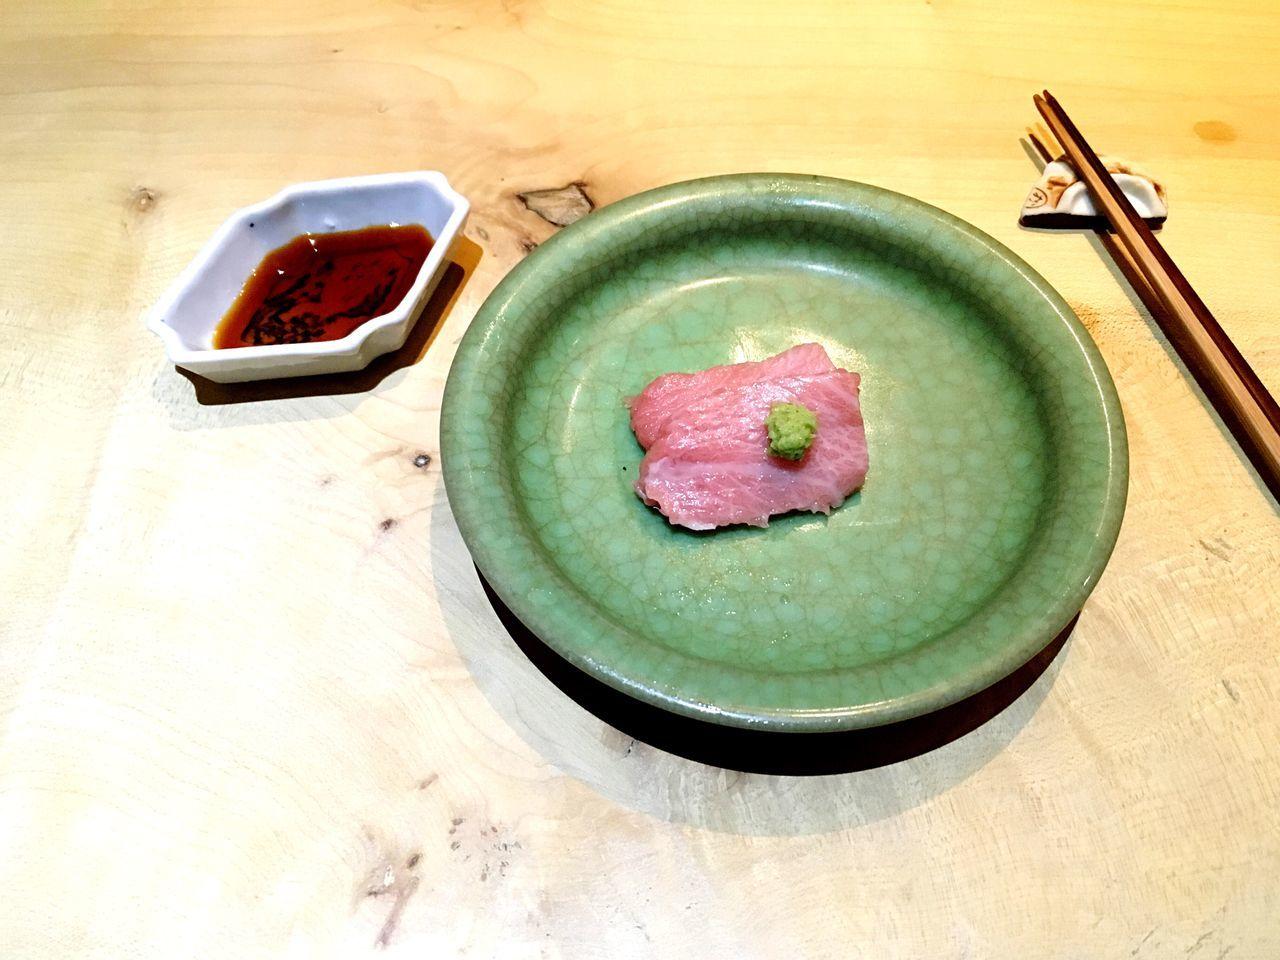 Blue Fin Tuna Sashimi  Fish Dinner In My Mouf Om Nom Nom